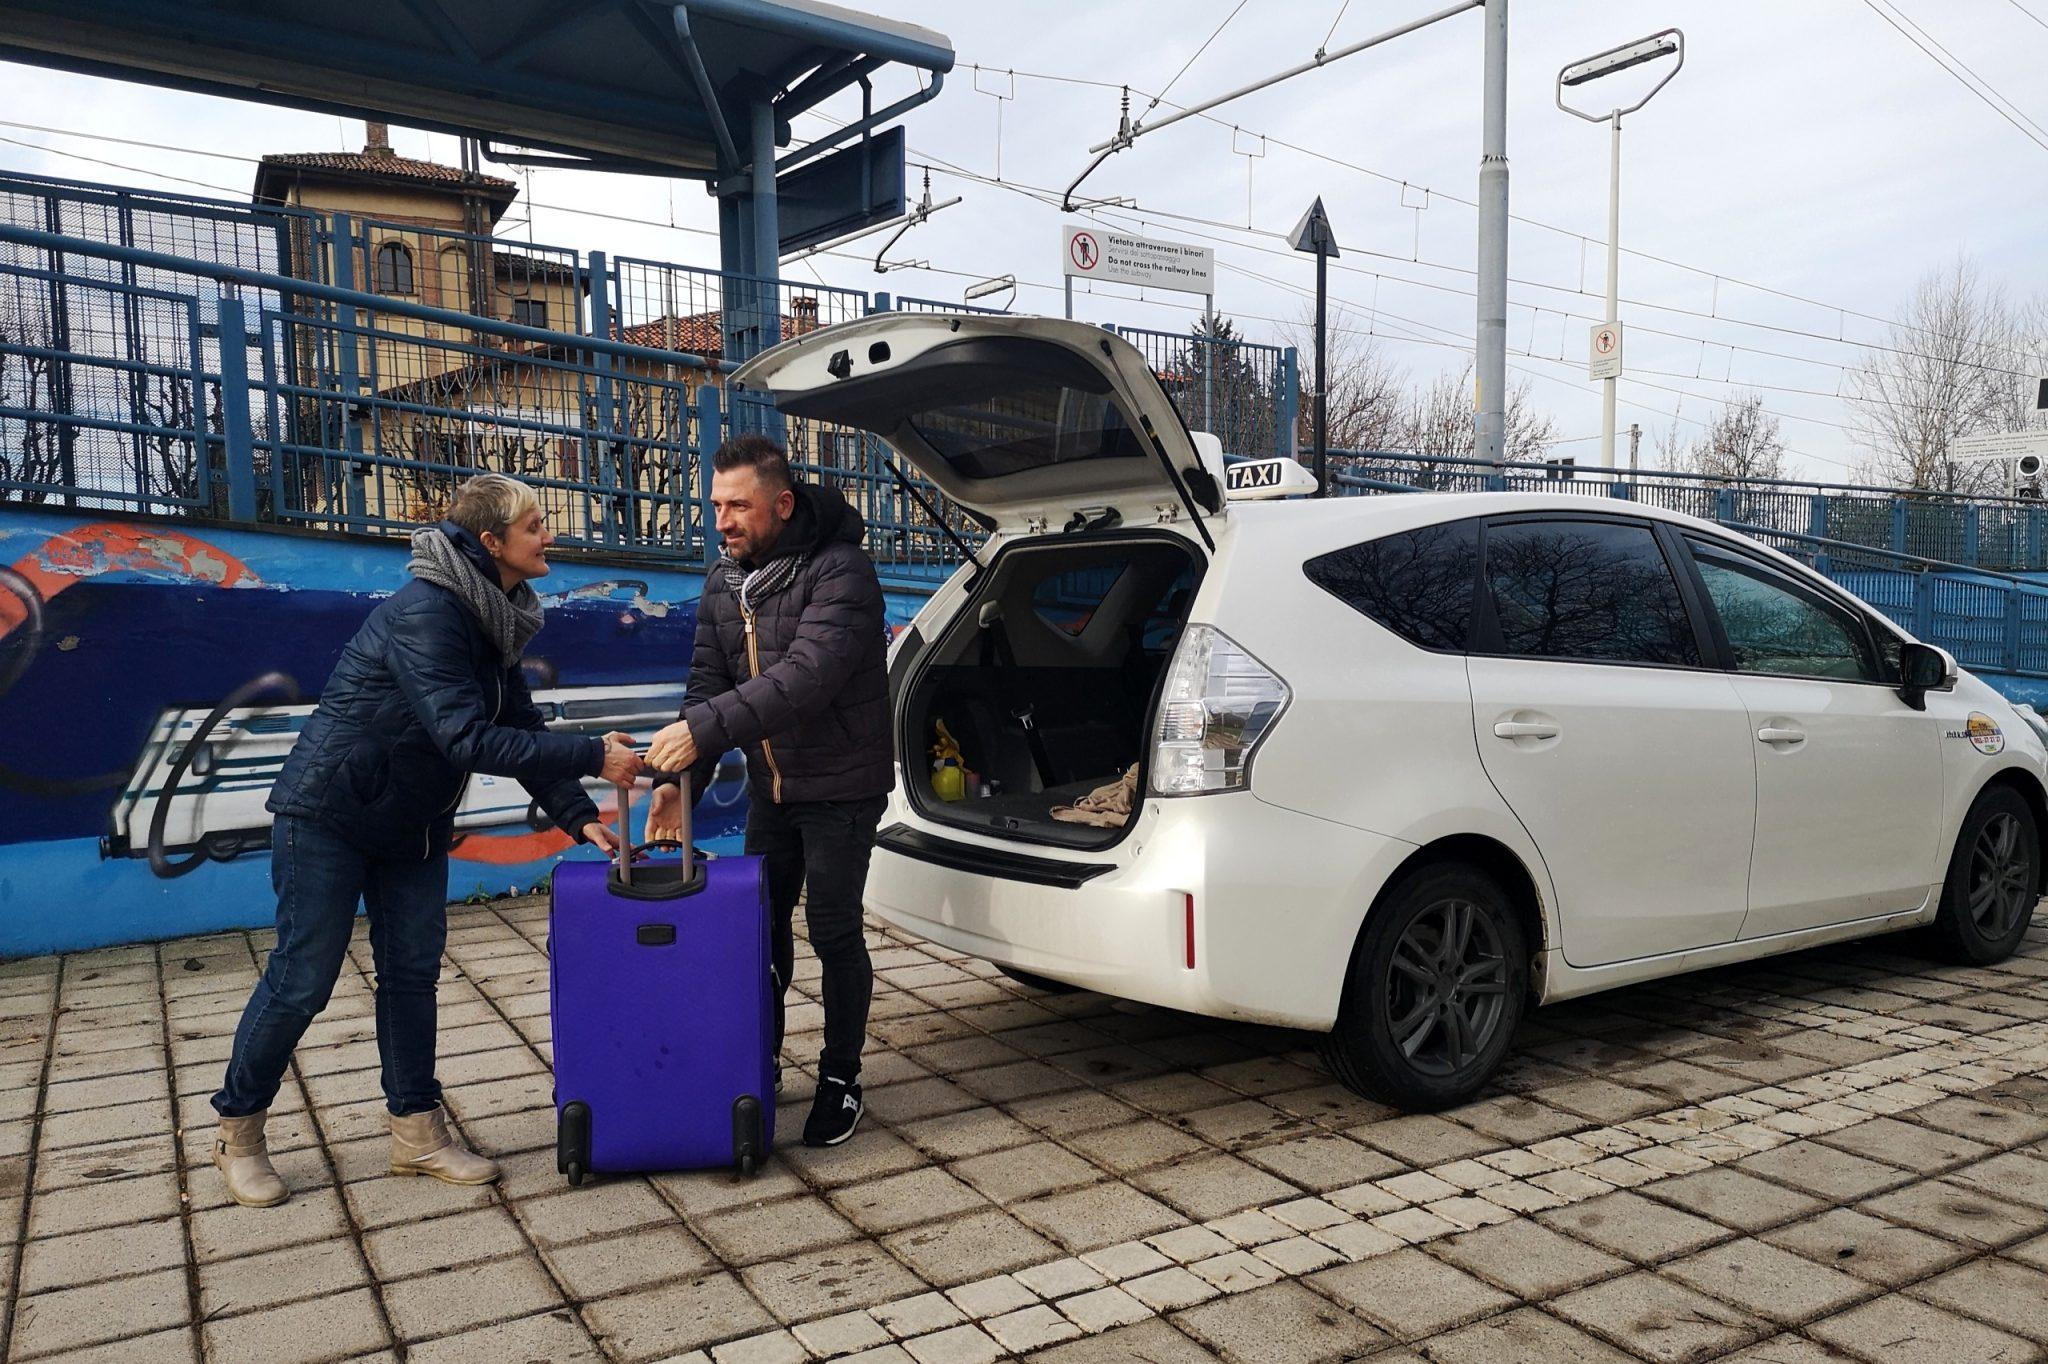 Bologna: Taxi driver o People Mover?